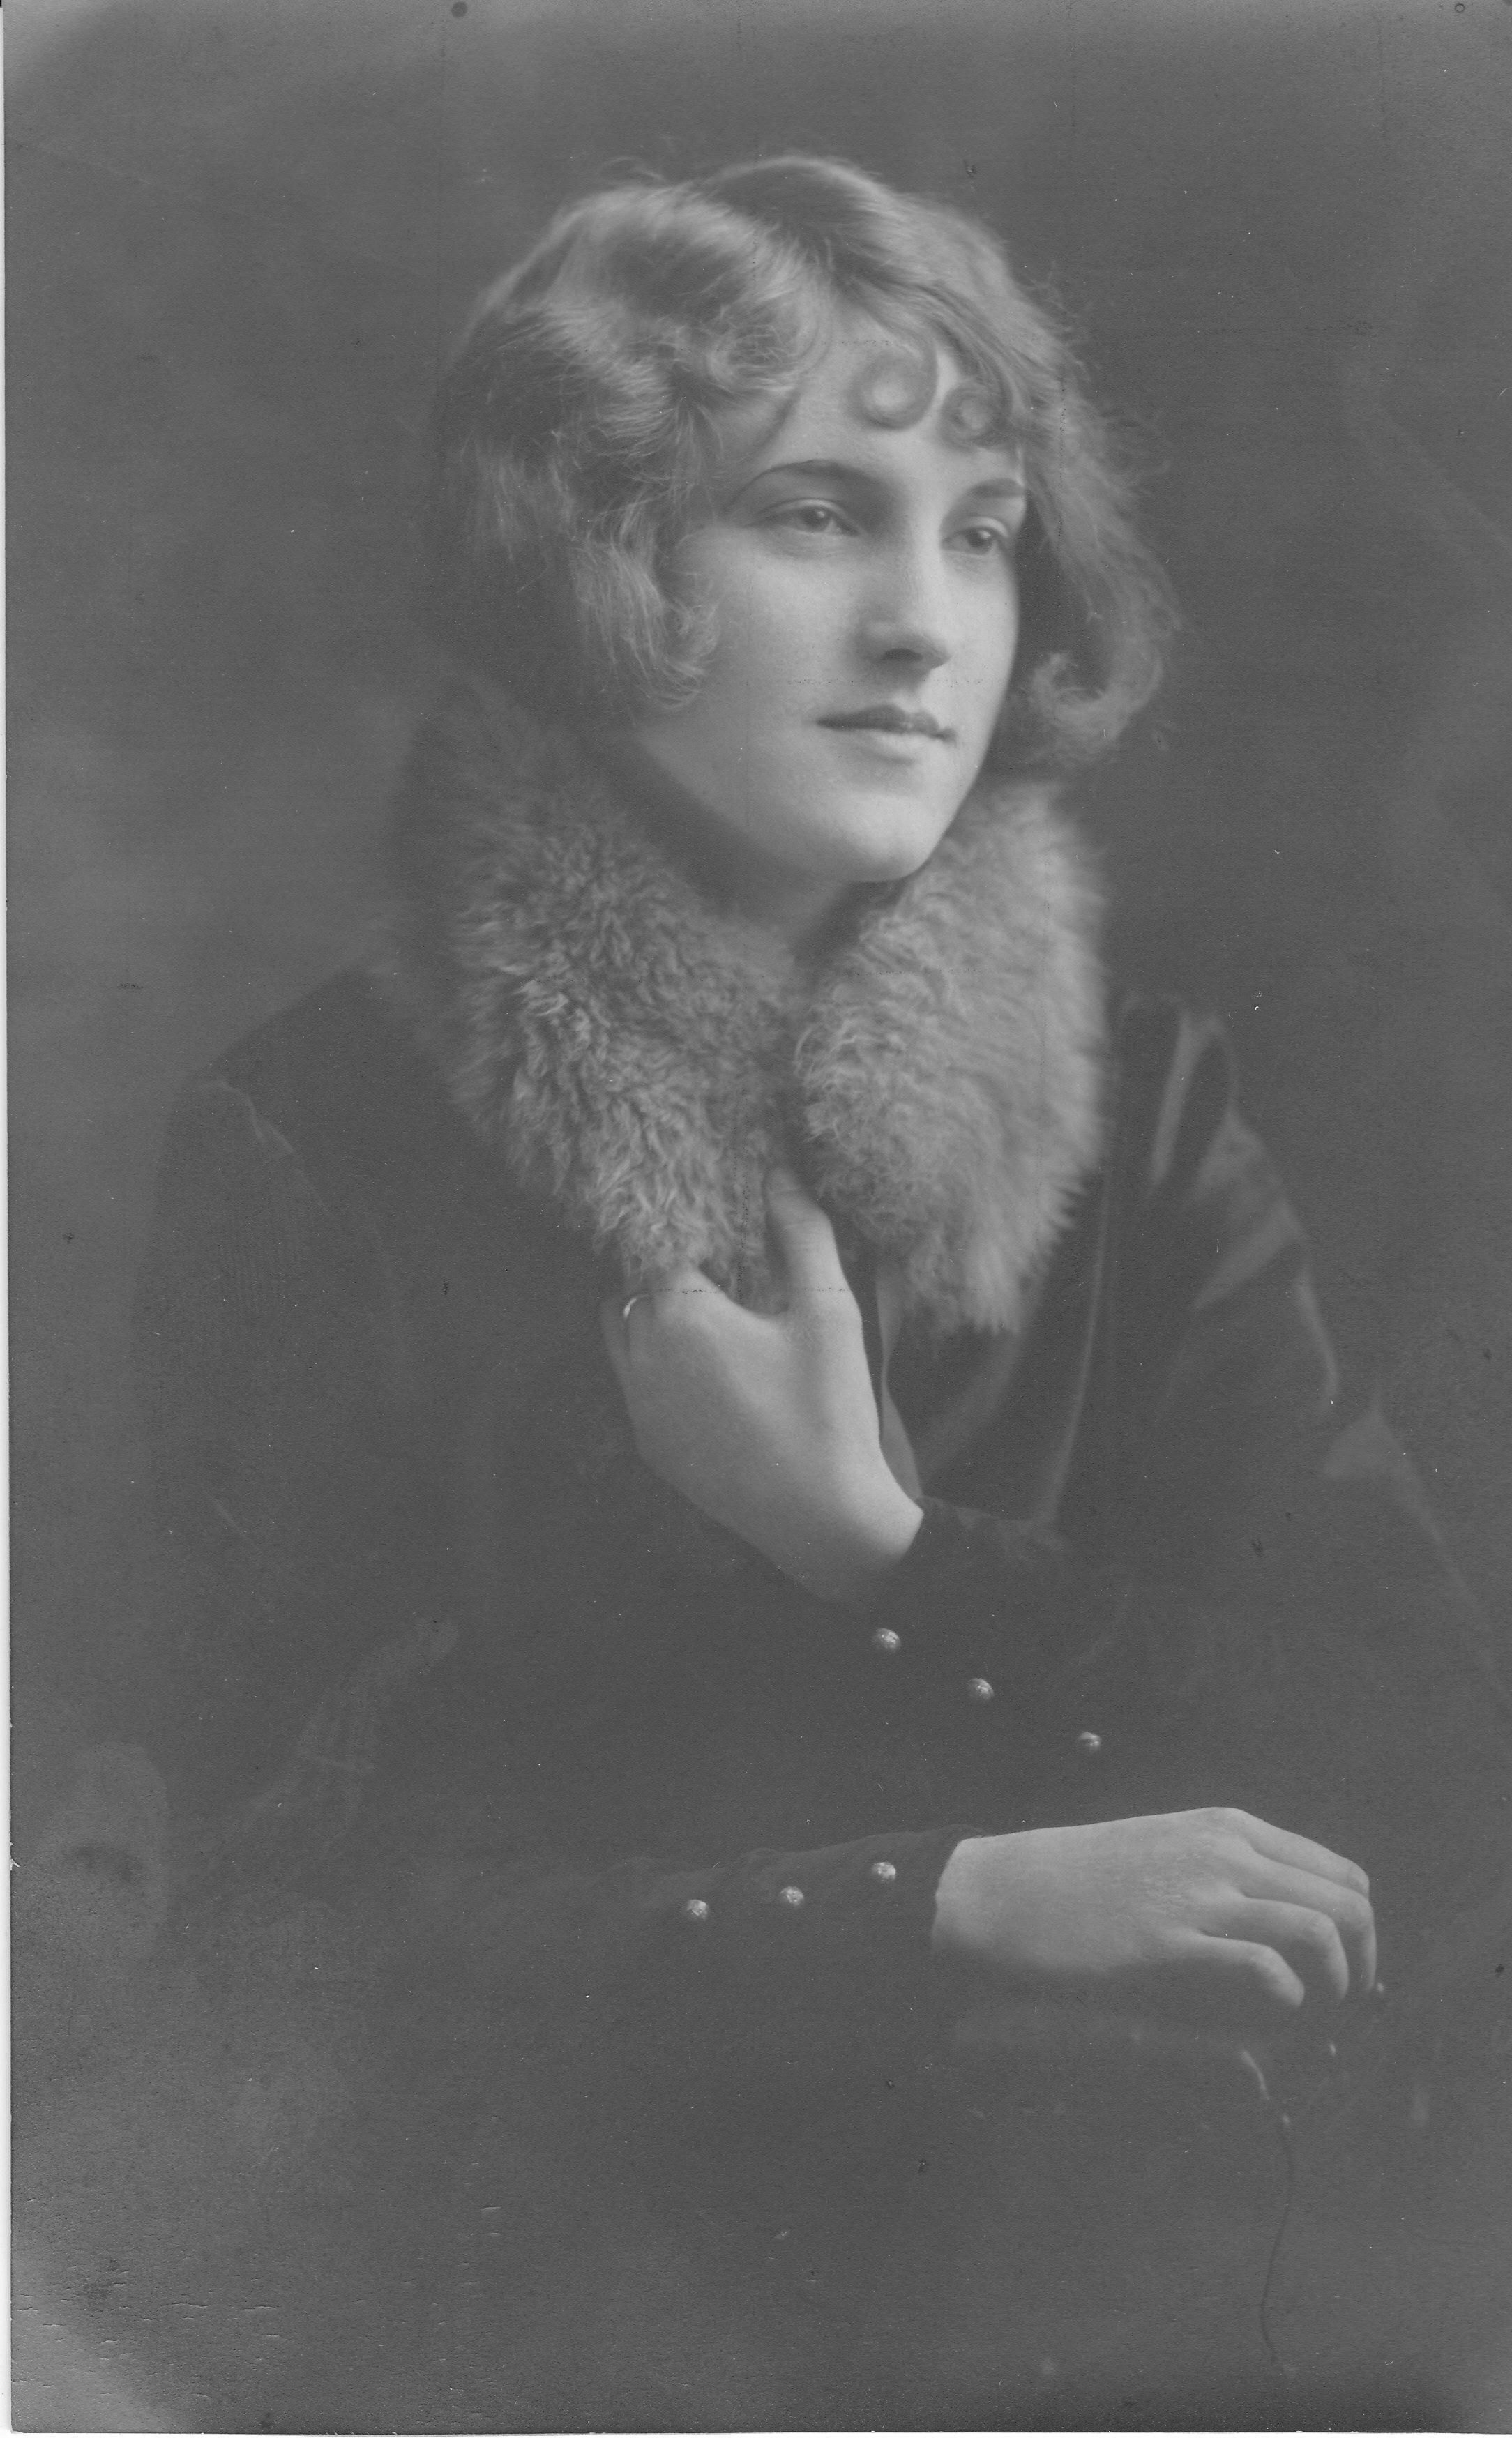 Adellma Jeanette Tuttle